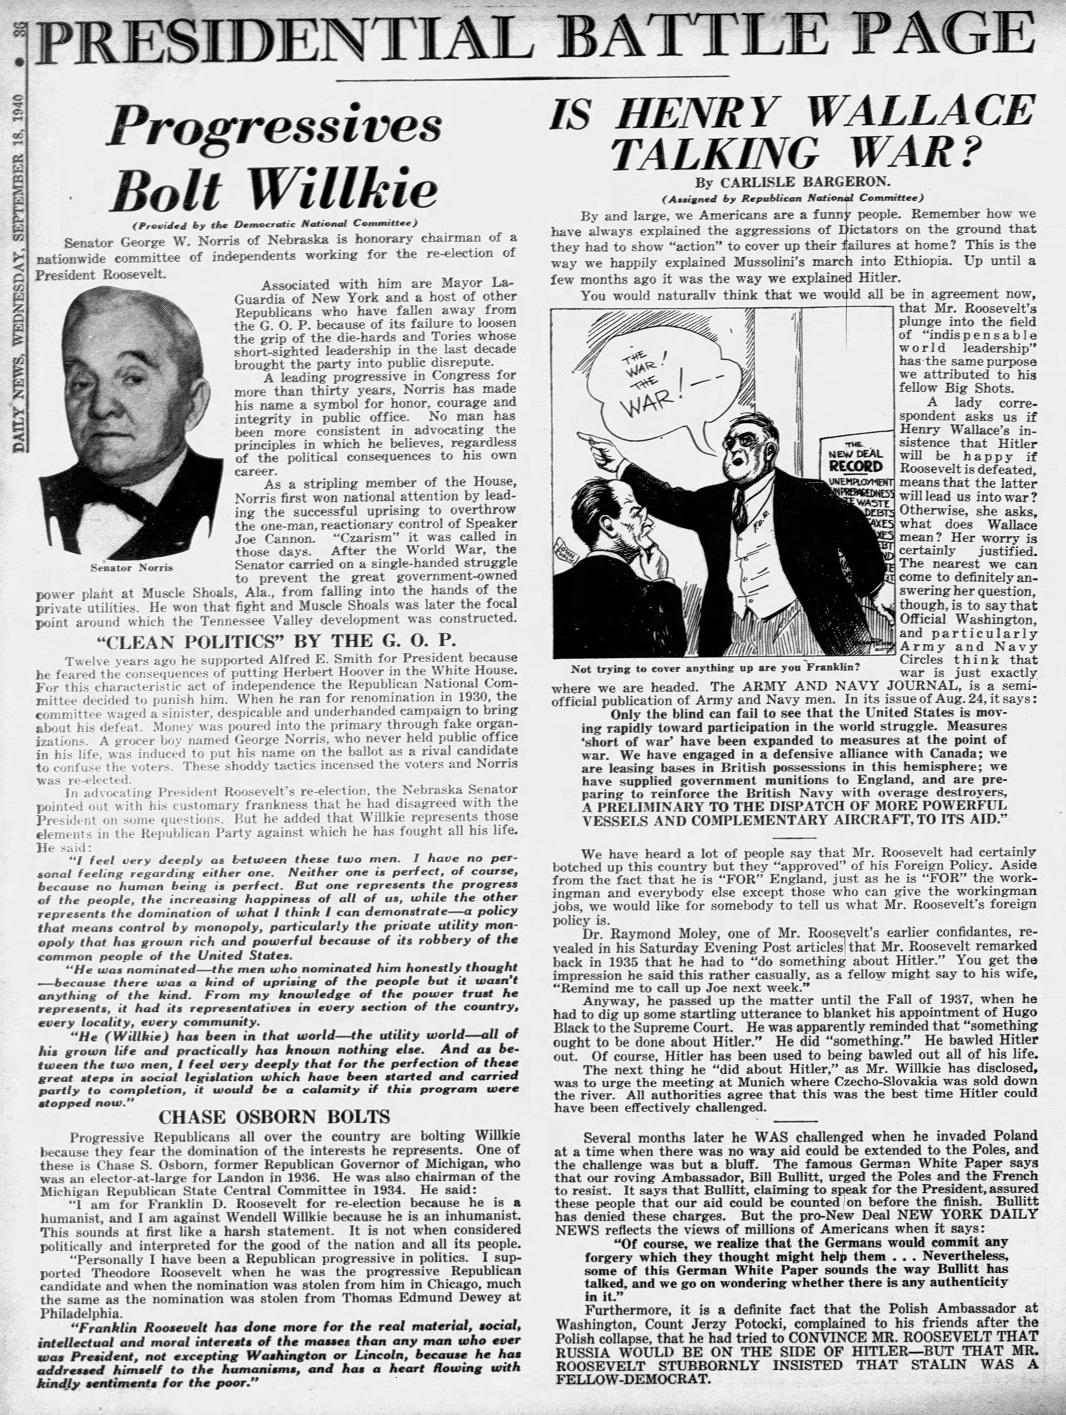 Daily_News_Wed__Sep_18__1940_(2).jpg